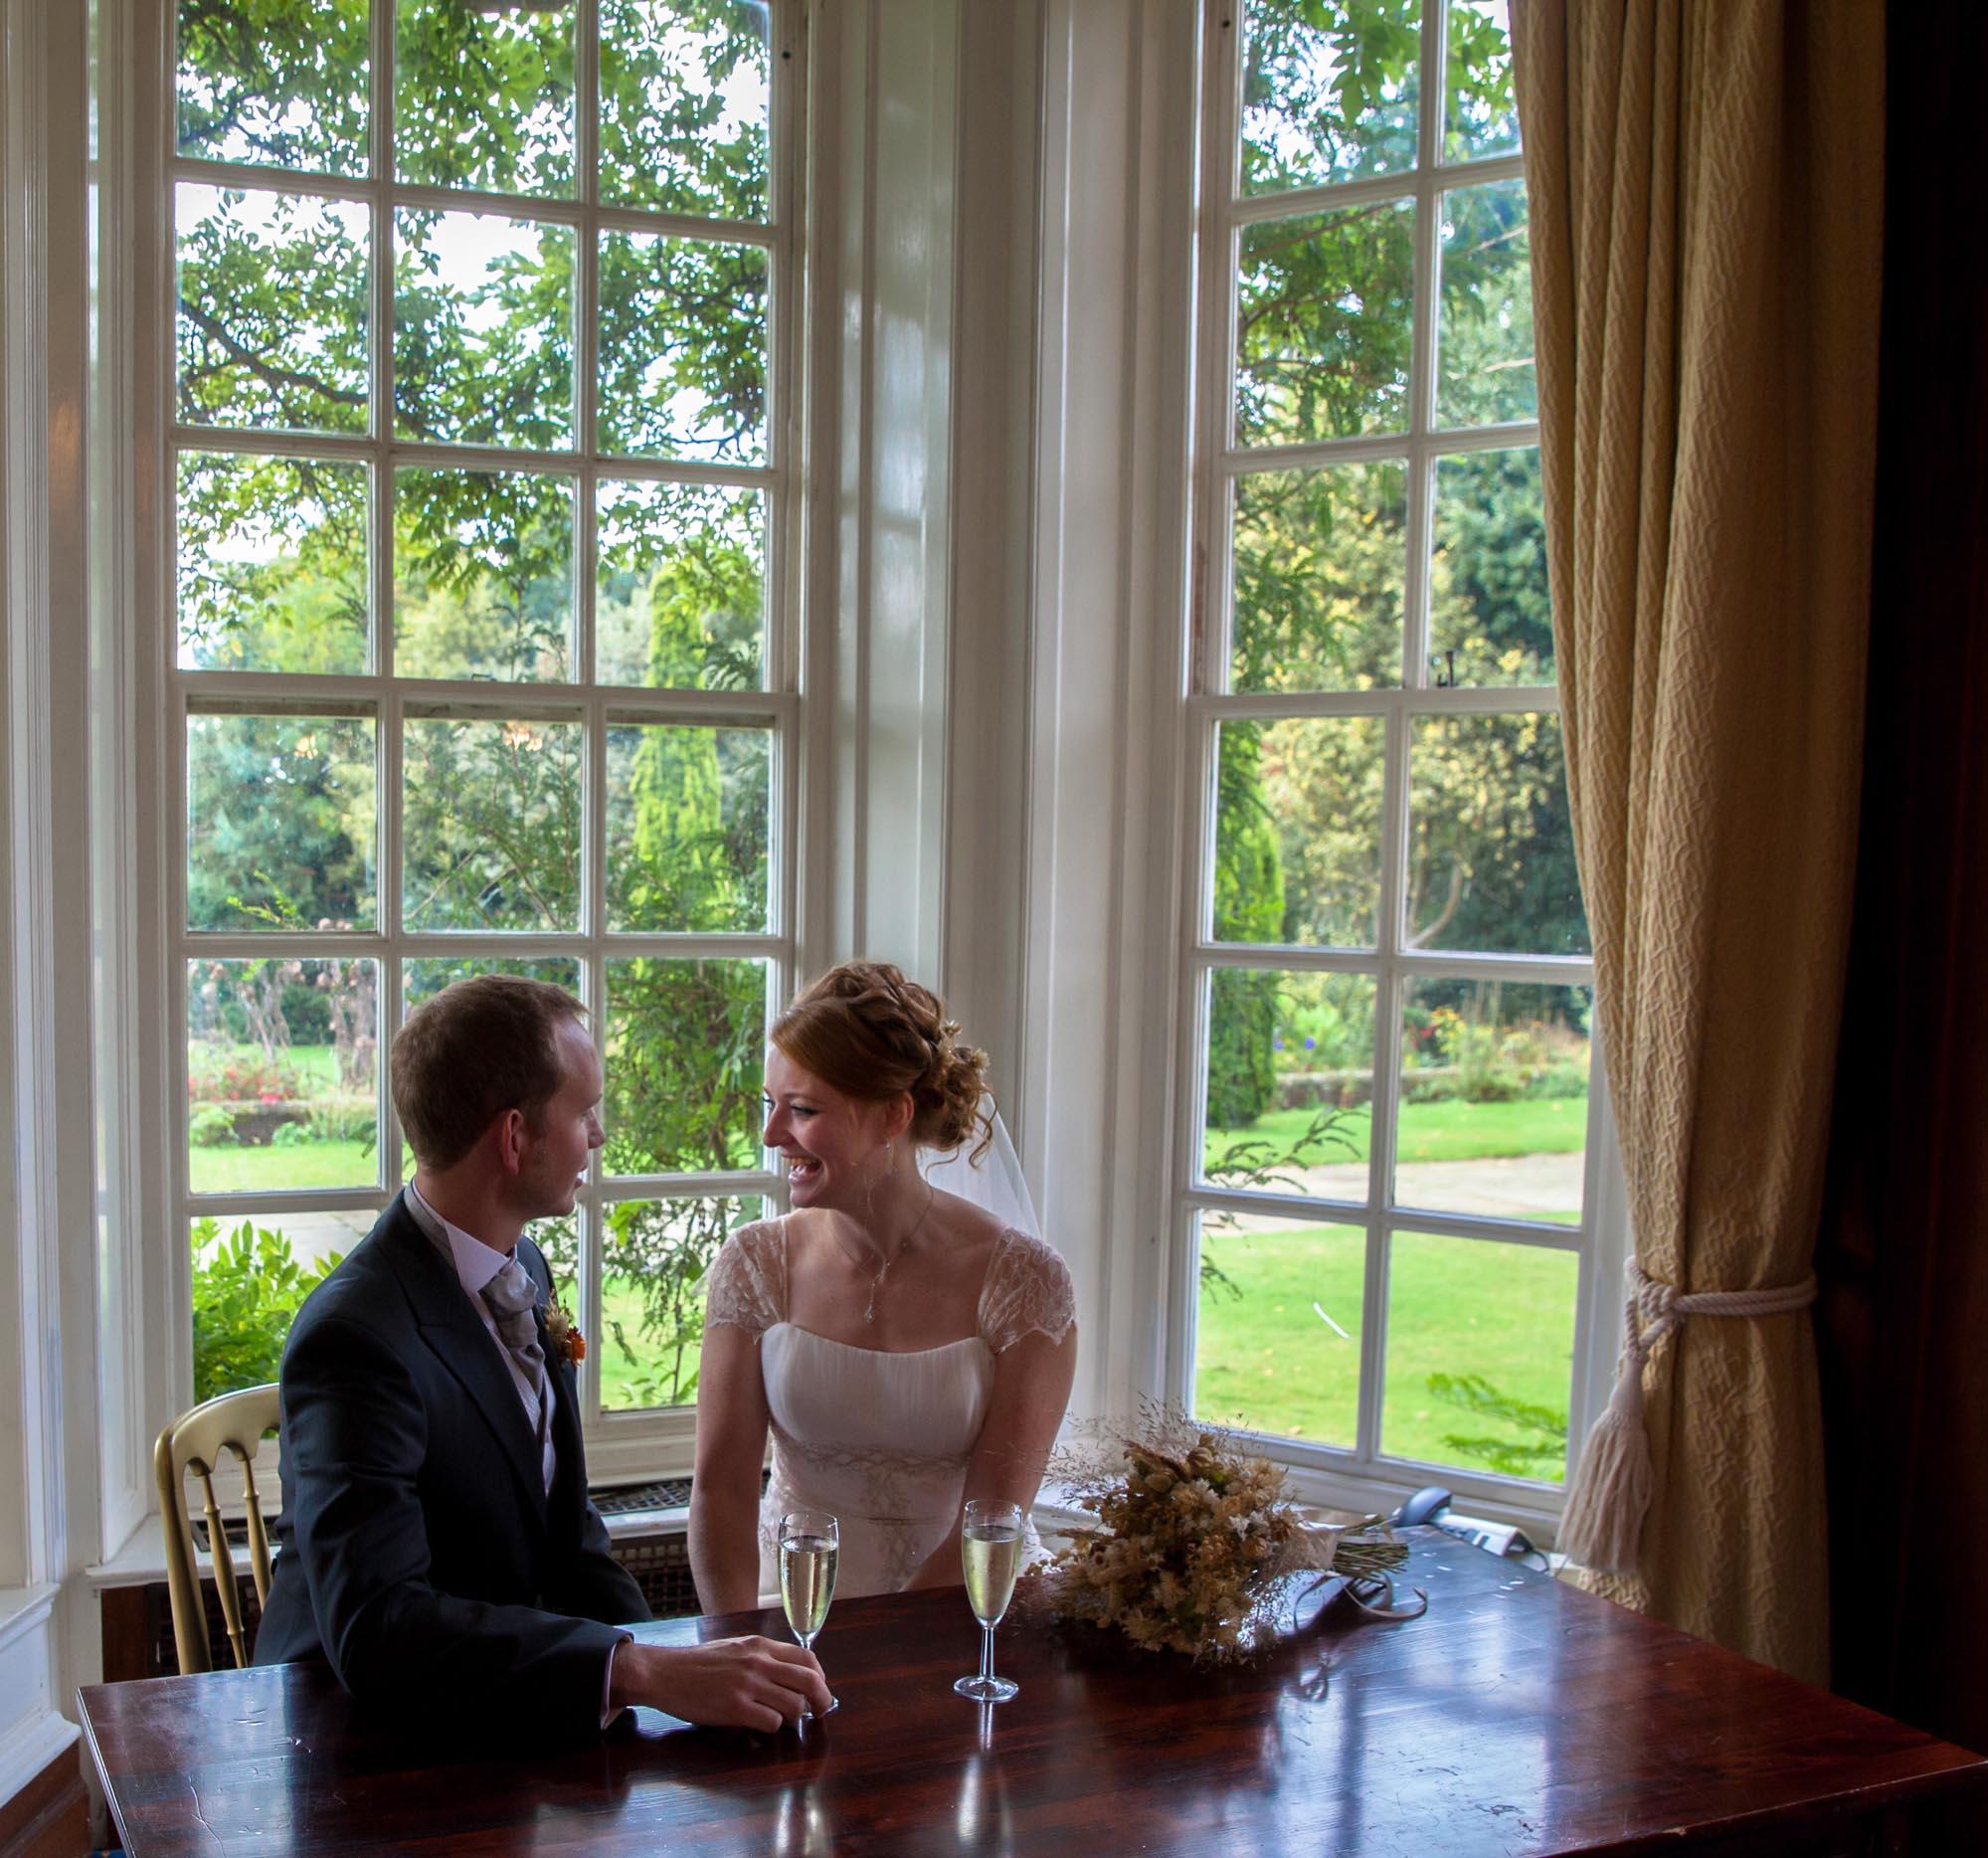 weddings-couples-love-photographer-oxford-london-jonathan-self-photography-41.jpg